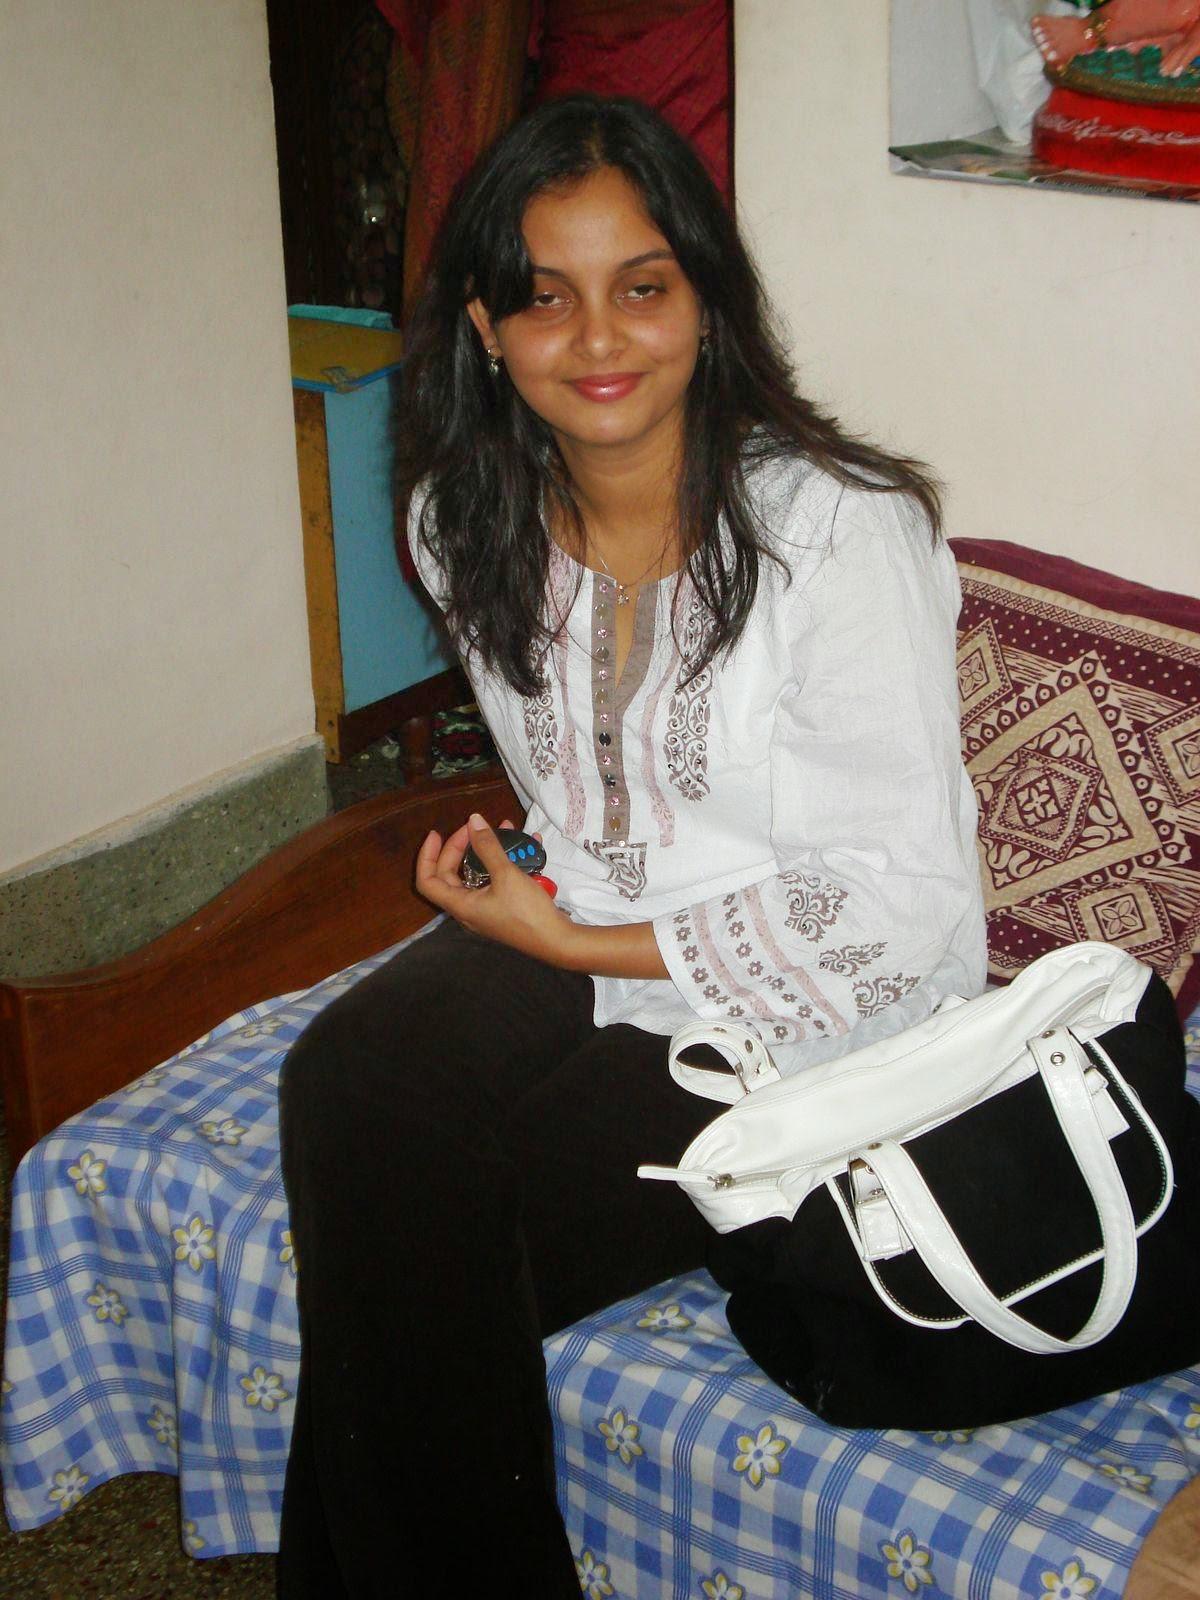 Desi Beautiful Hot Girls In Bedroom New Hd 2015 Pictures -1883